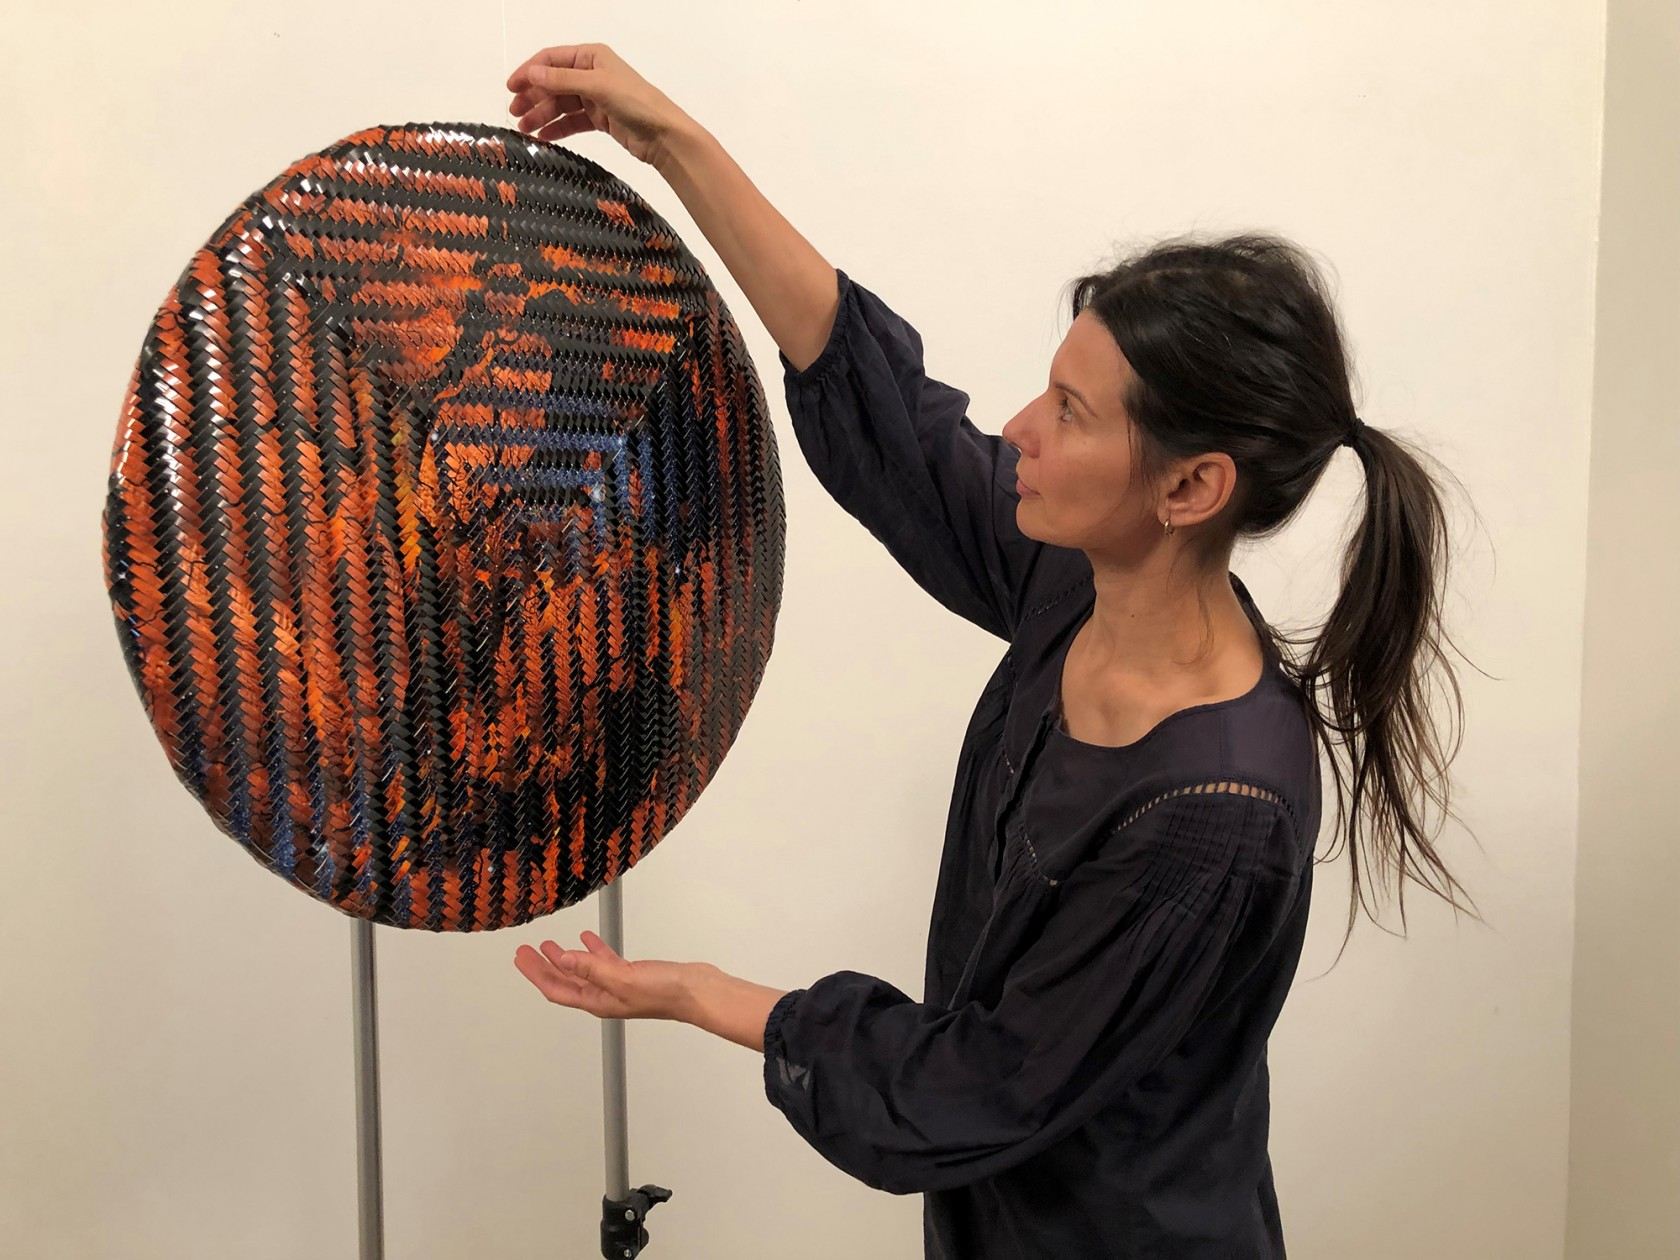 Artists on Artists: Clarissa Tossin on With Pleasure